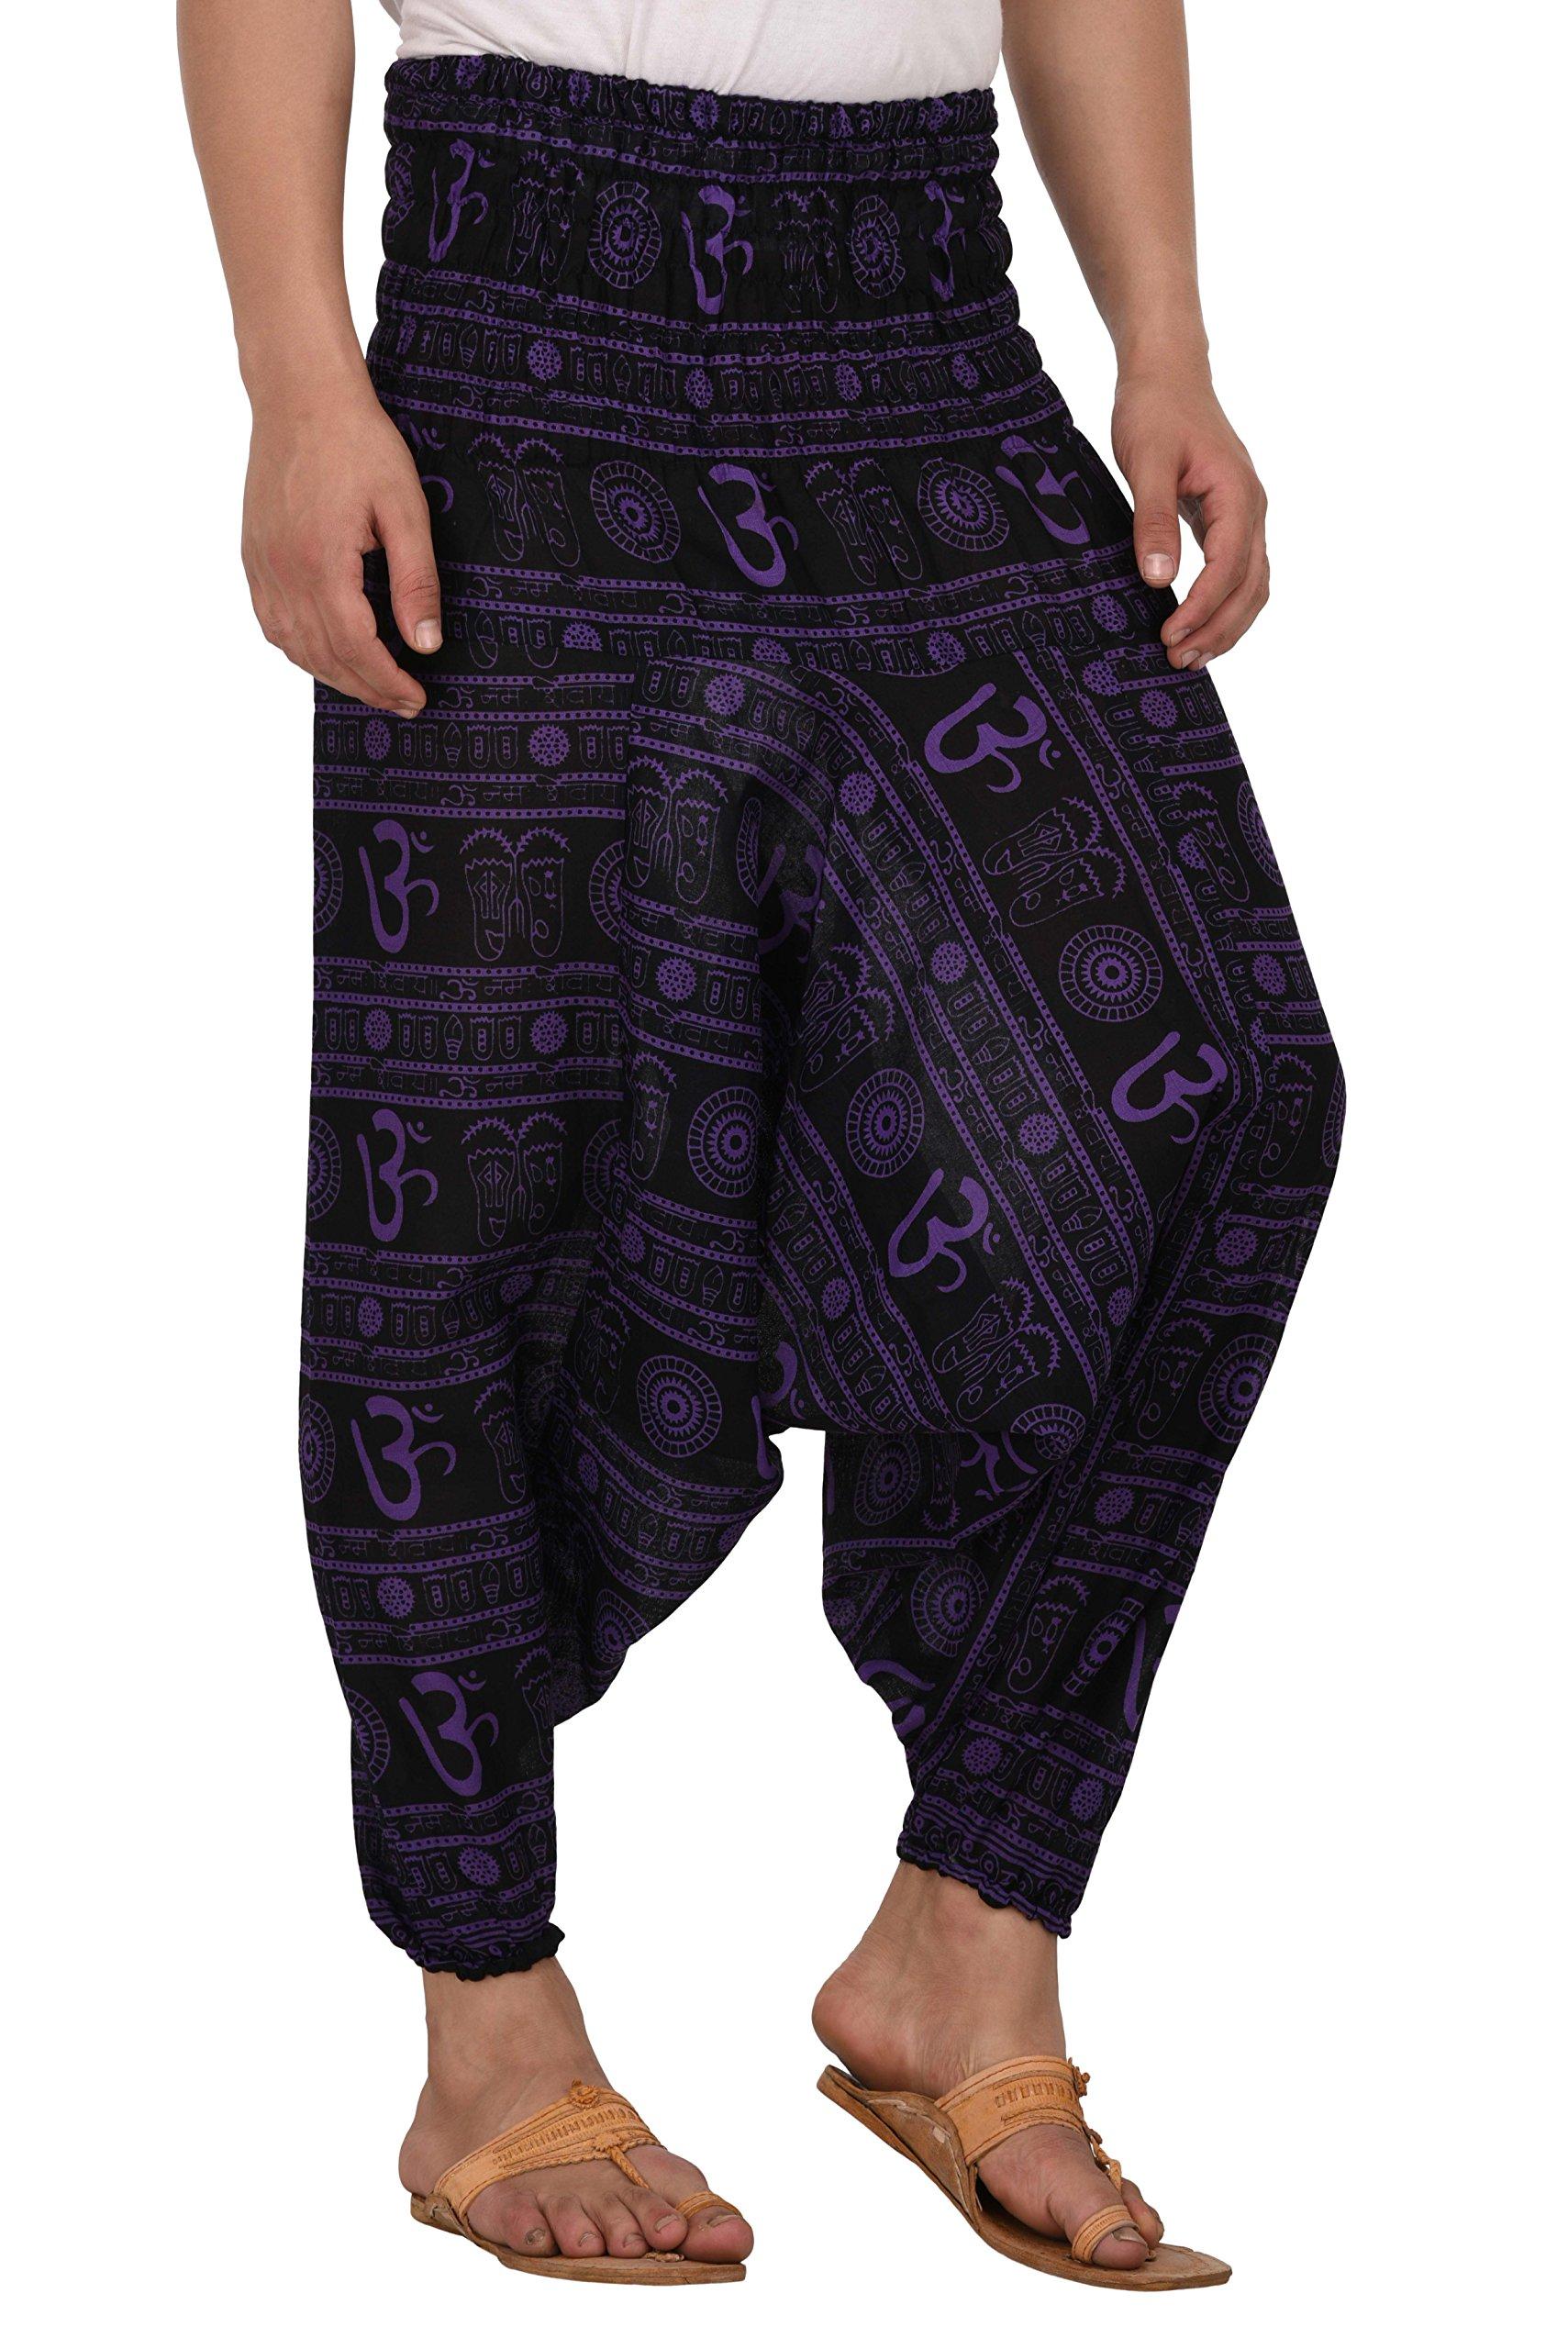 Kiara Men Women Premium Quality Cotton Baggy Hippie Boho Gypsy Aladdin Yoga Harem Pants with Pockets - Om Print